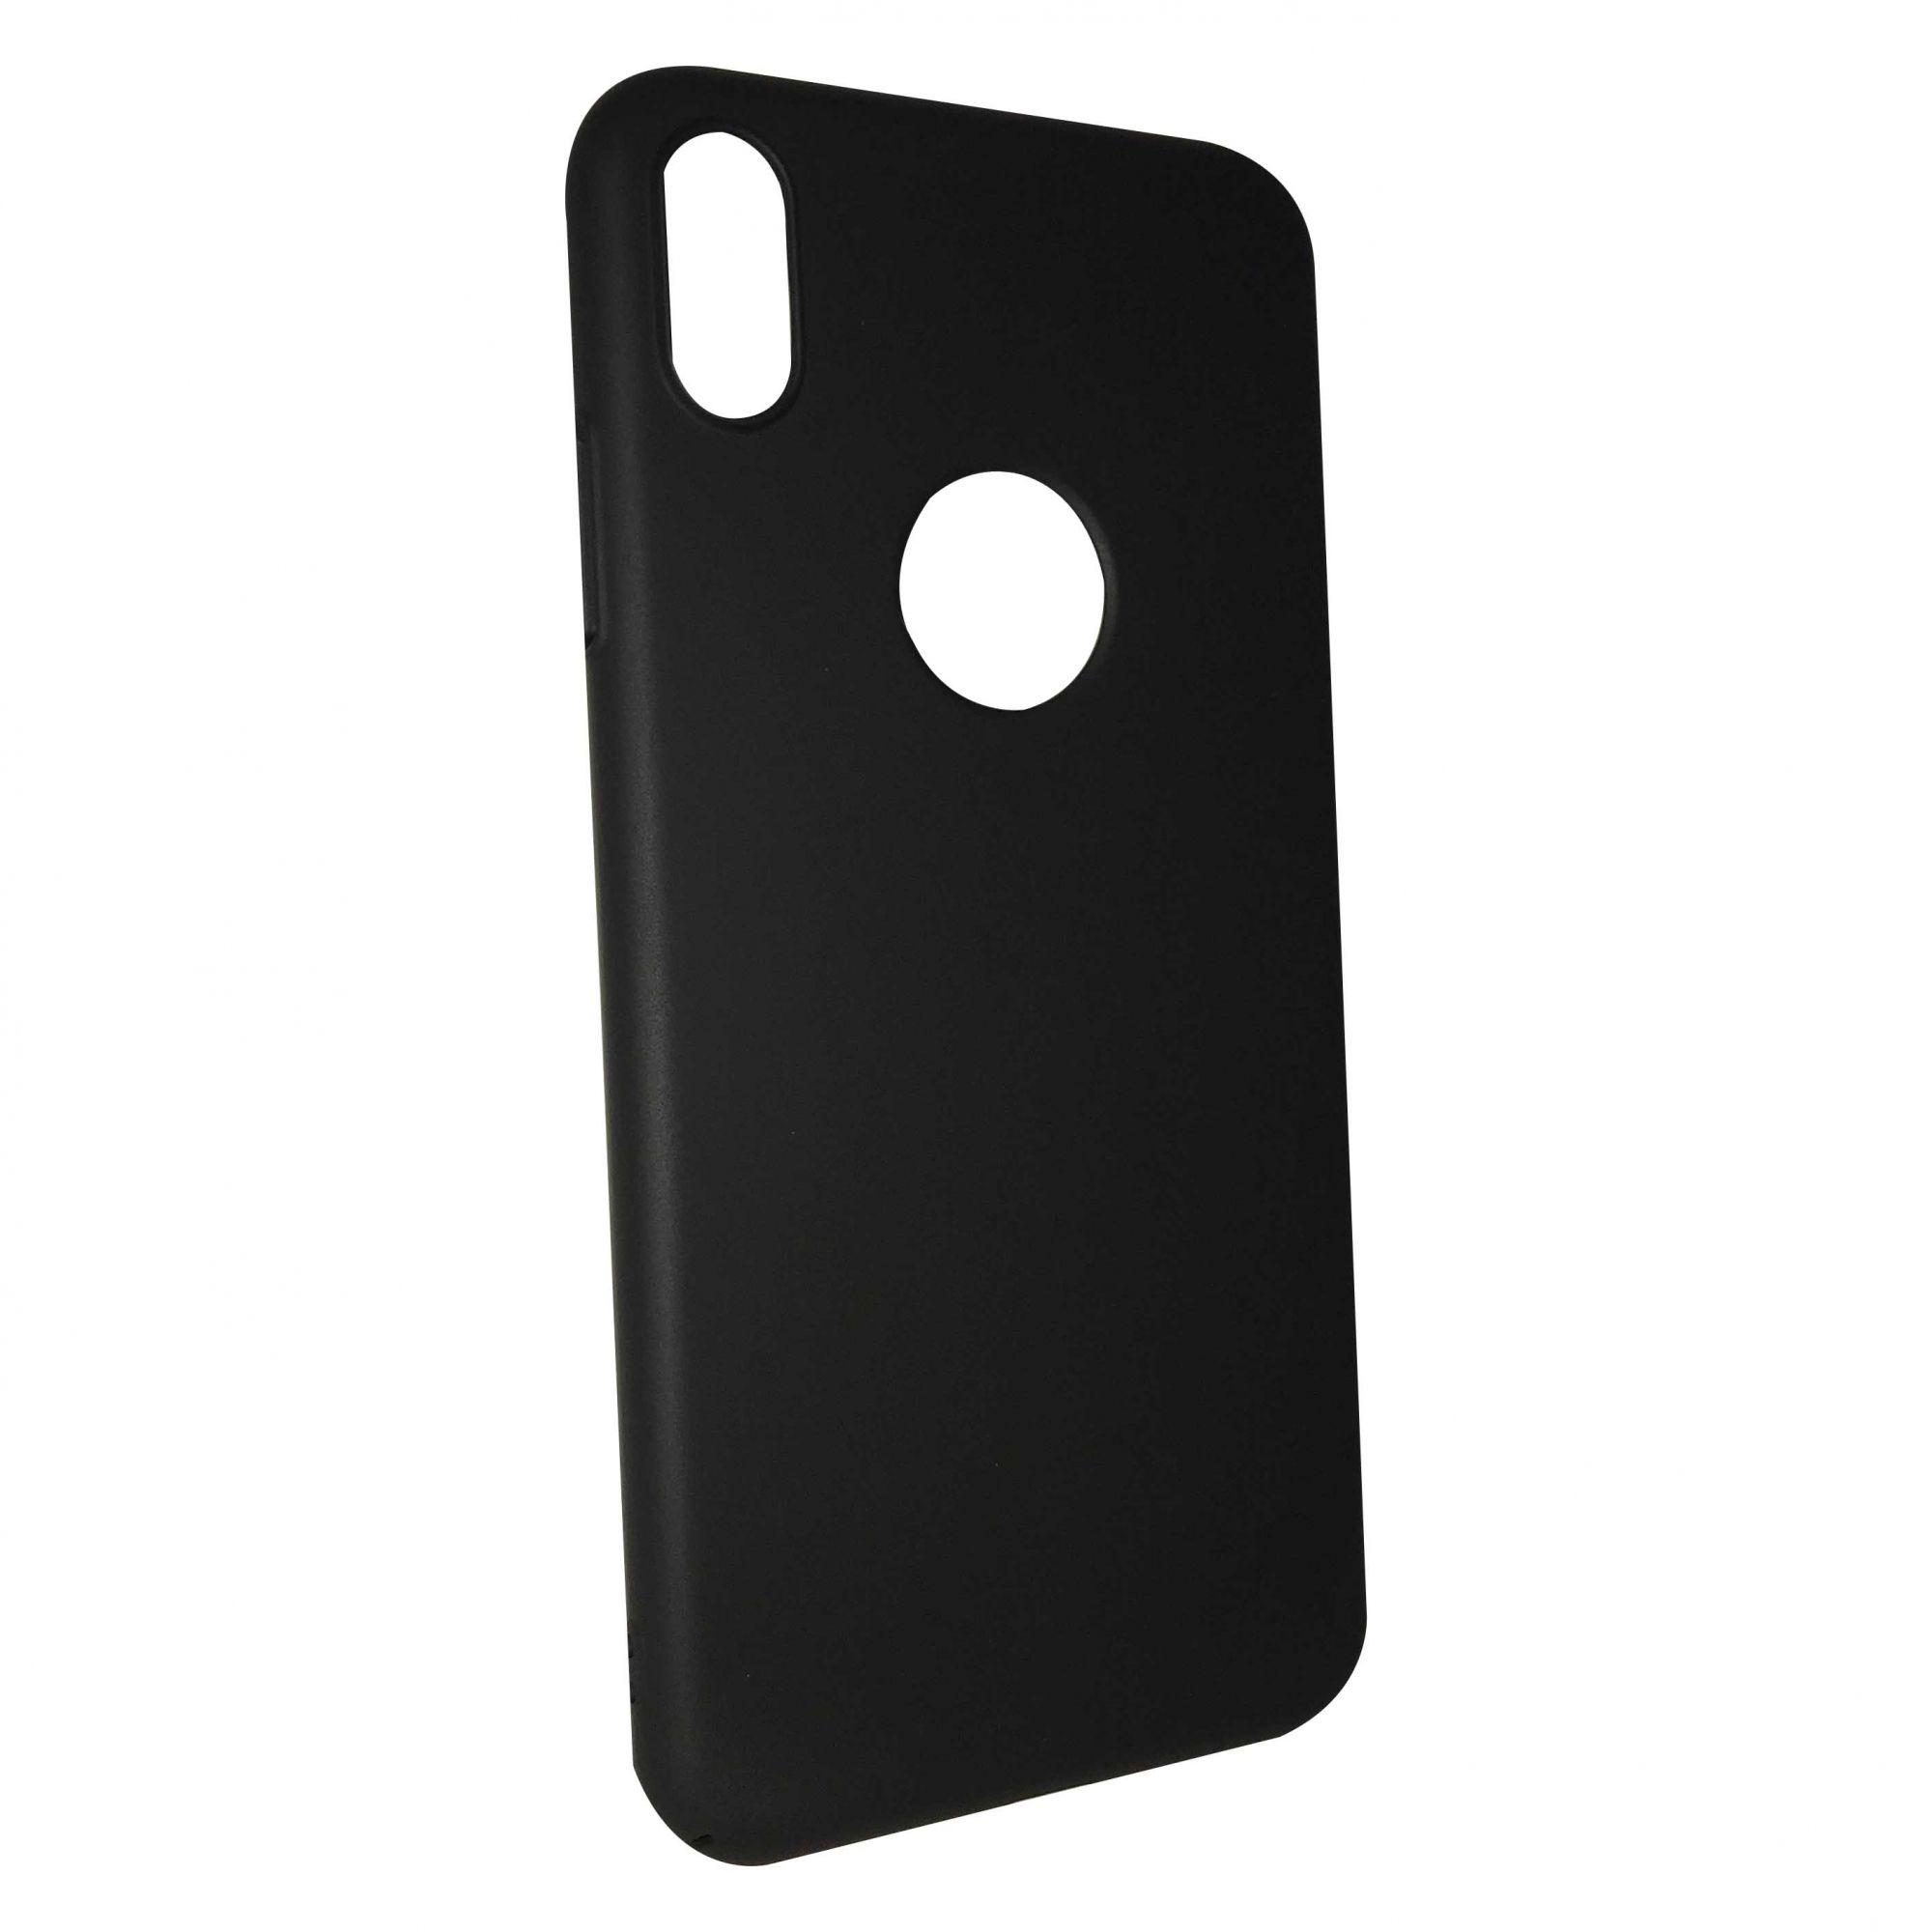 Capa iKase Fit Case iPhone X XS - Preta